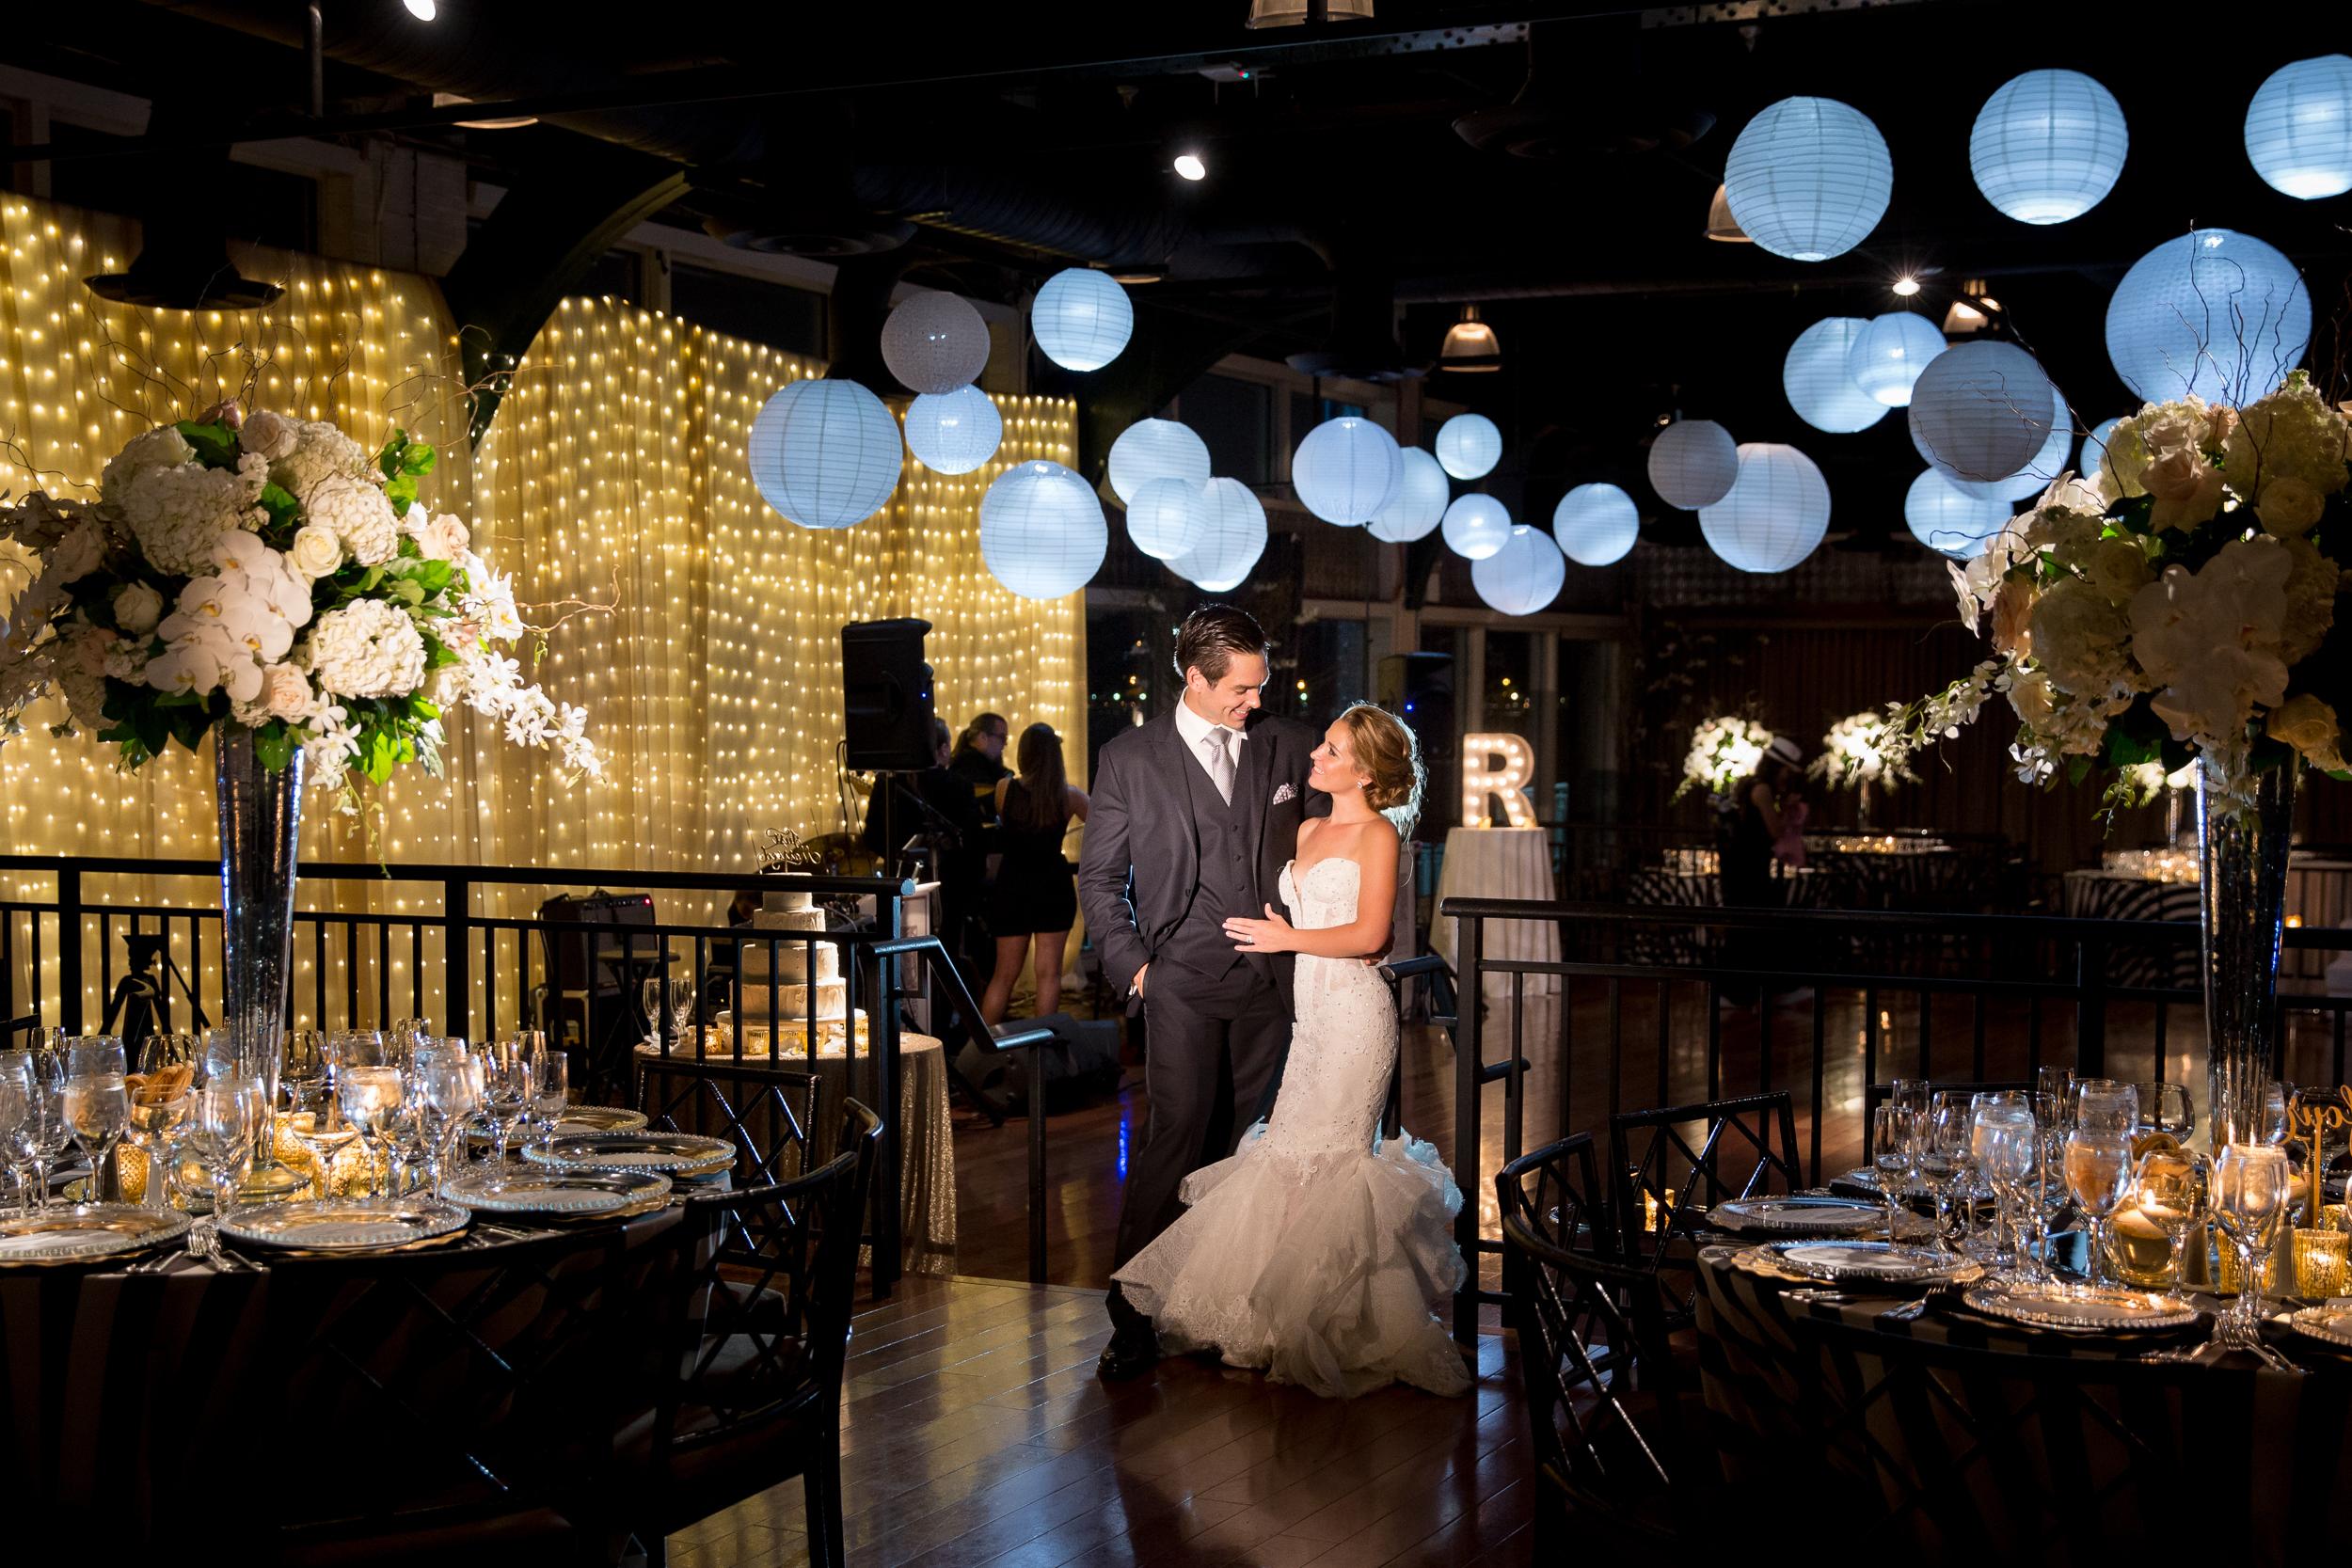 Ceci_New_York_Style_Luxury_Custom_Summer_Wedding_CeciBride_Letterpress_NewYork_Foil_Lighthouse_Chelsea_Piers_68.jpg